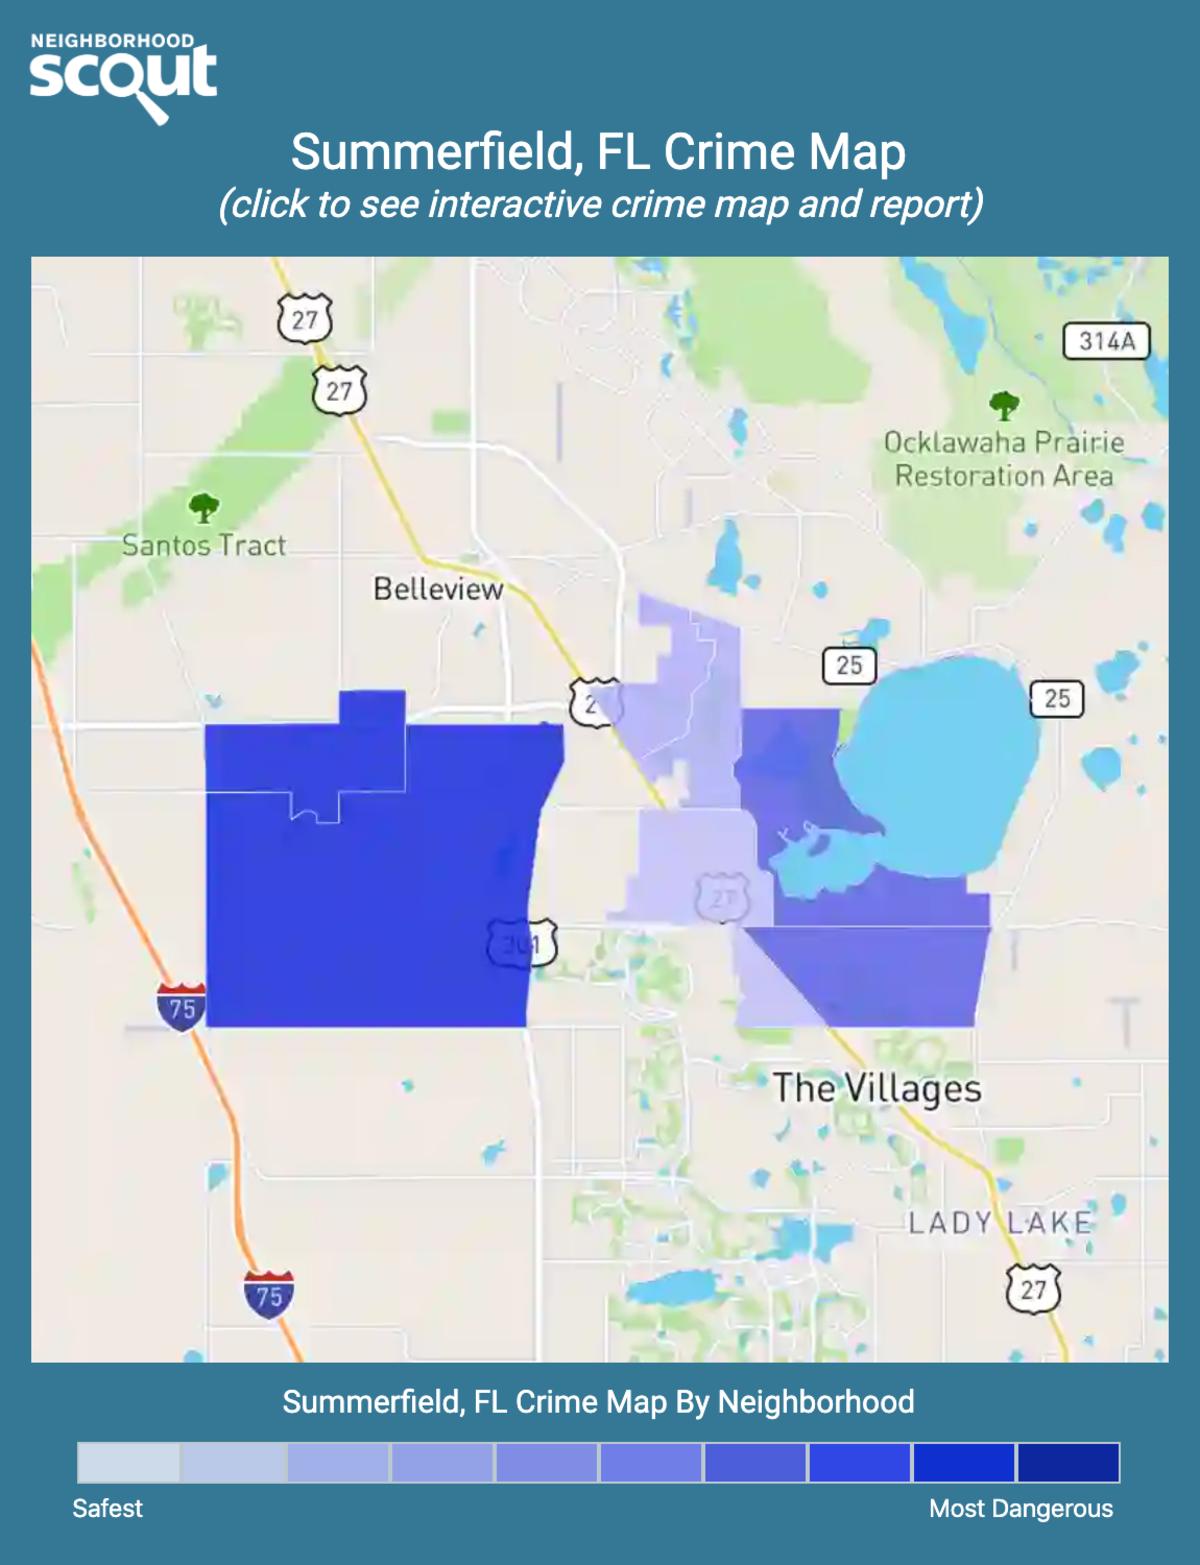 Summerfield, Florida crime map